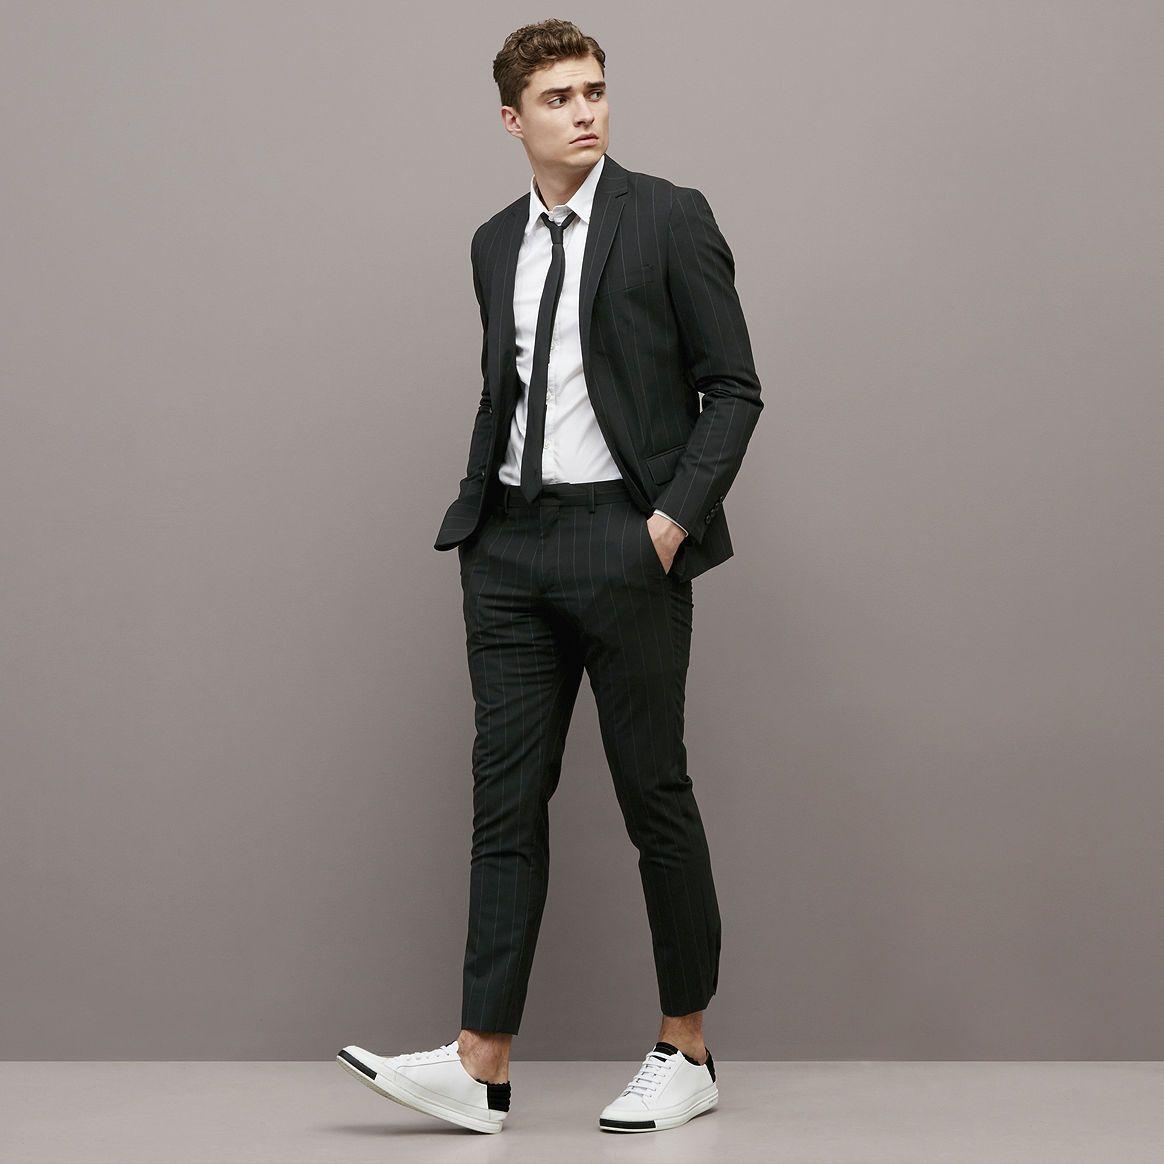 Slim Fit Suits Vs Classic Fit Suits Skinny Guys Slim